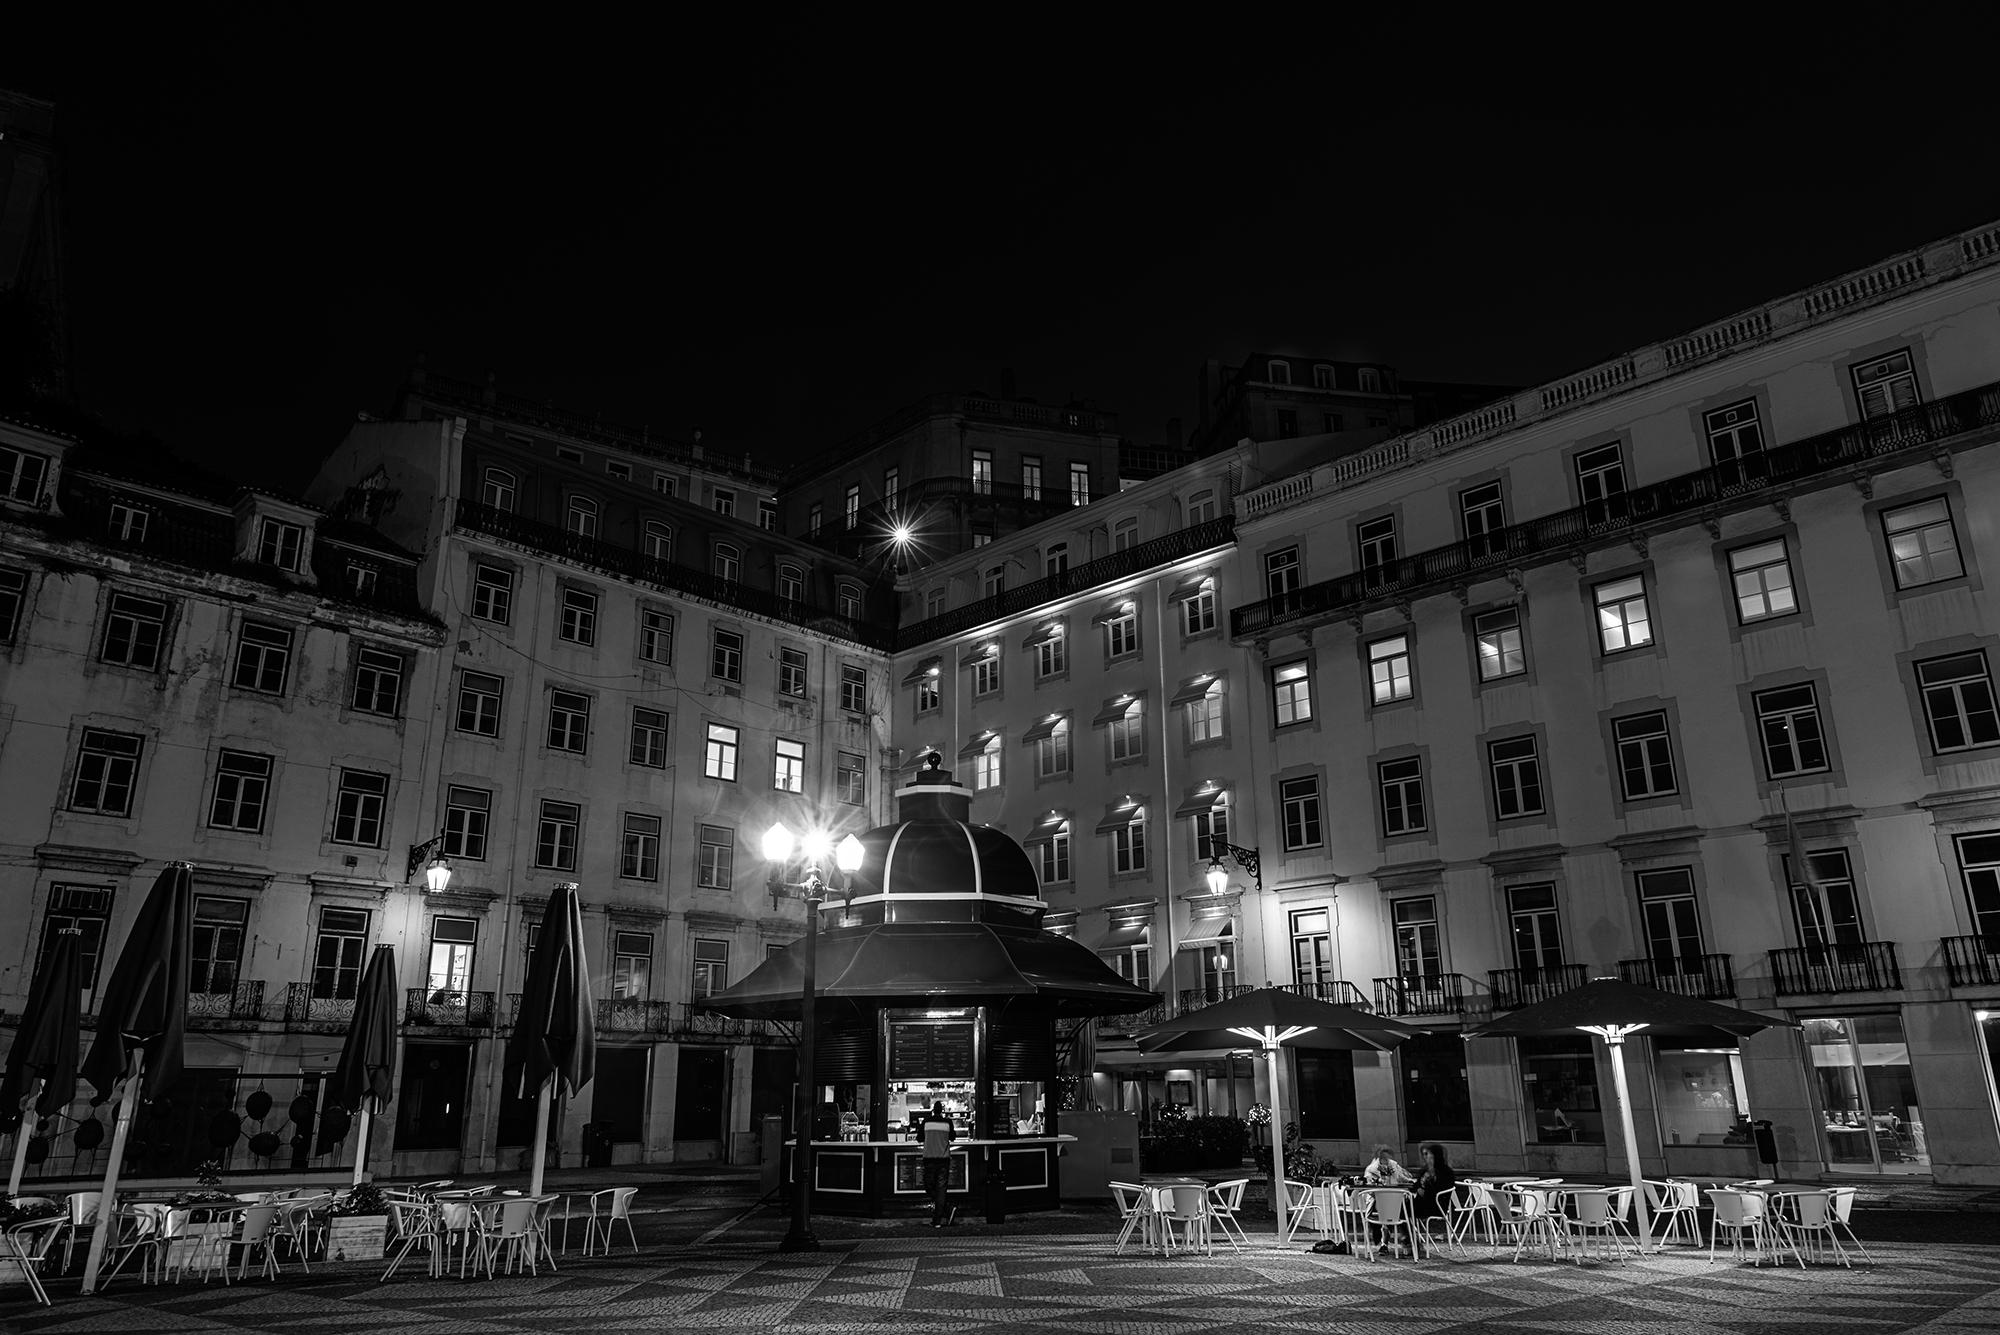 Praça do Municipio square at night